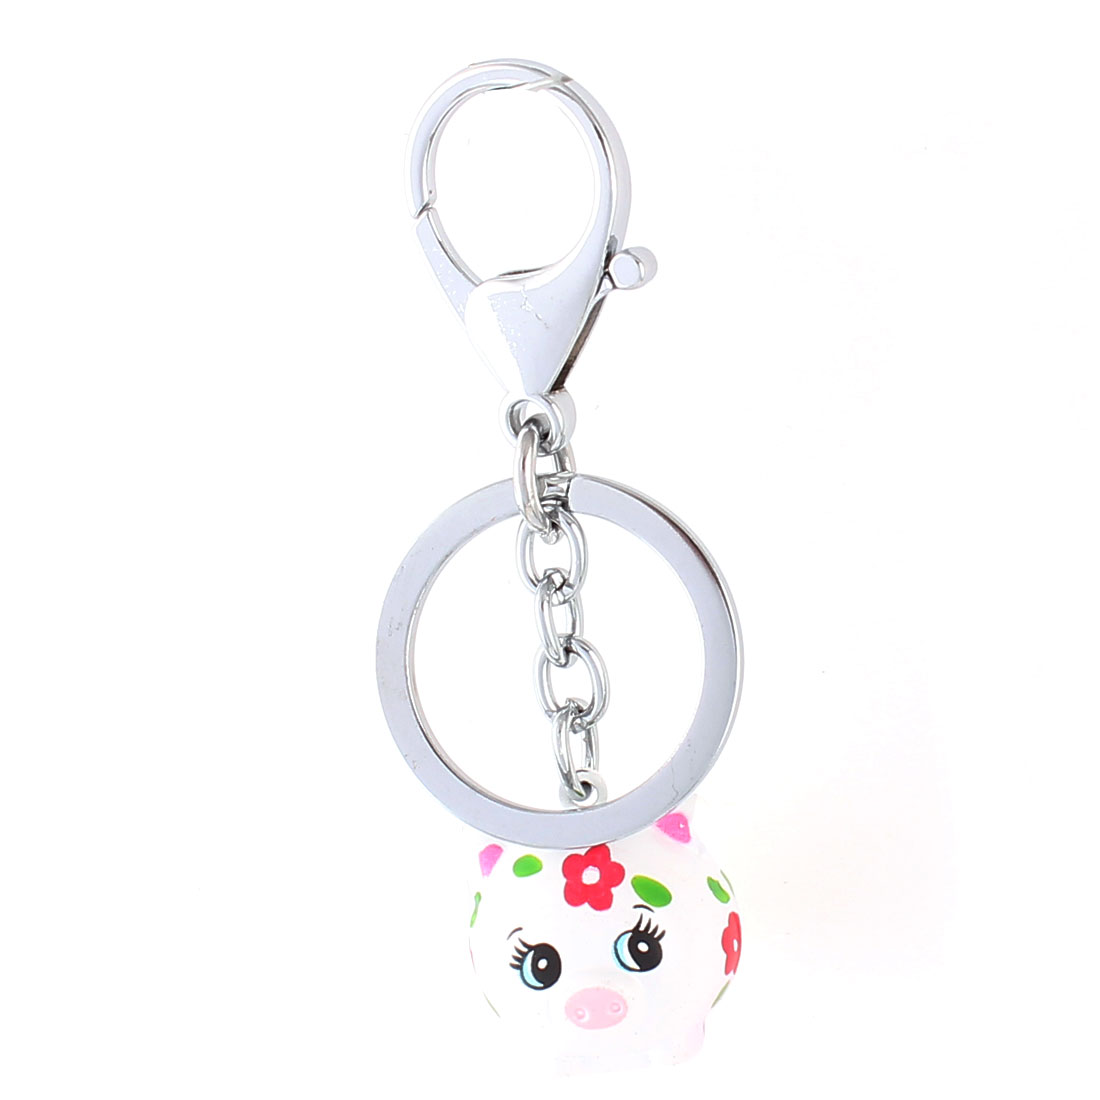 White Dangling Fat Pig Bells Decor Key Ring Keychain Keyring